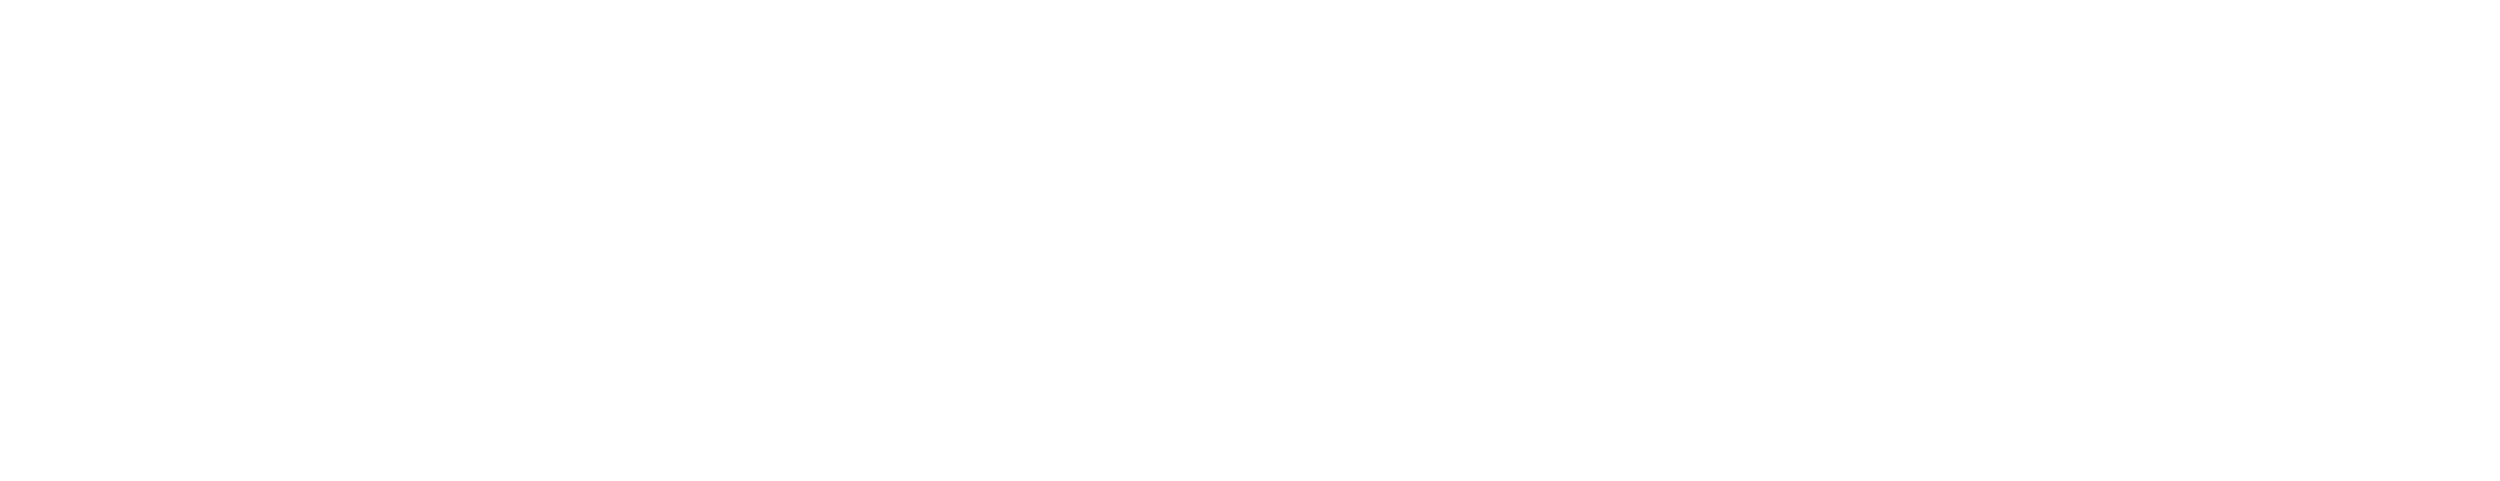 Fujifilm_logo_logotype copy.png